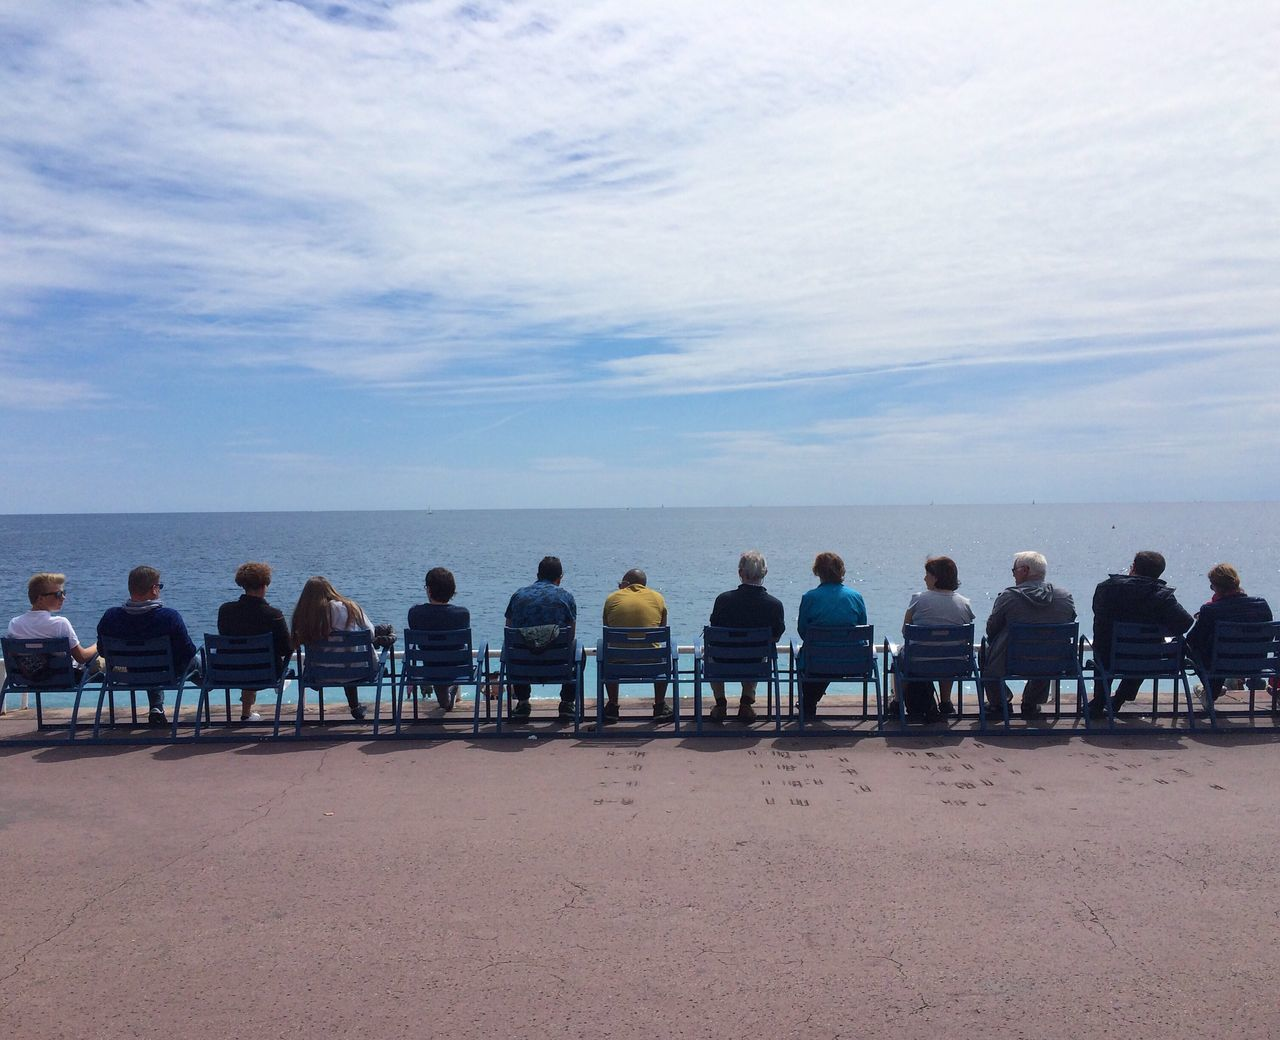 Nice  Promenade Des Anglais First Eyeem Photo Frenchriviera Chill Sun Seaside Beach Break The Mold EyeEmNewHere Fresh On Market 2017